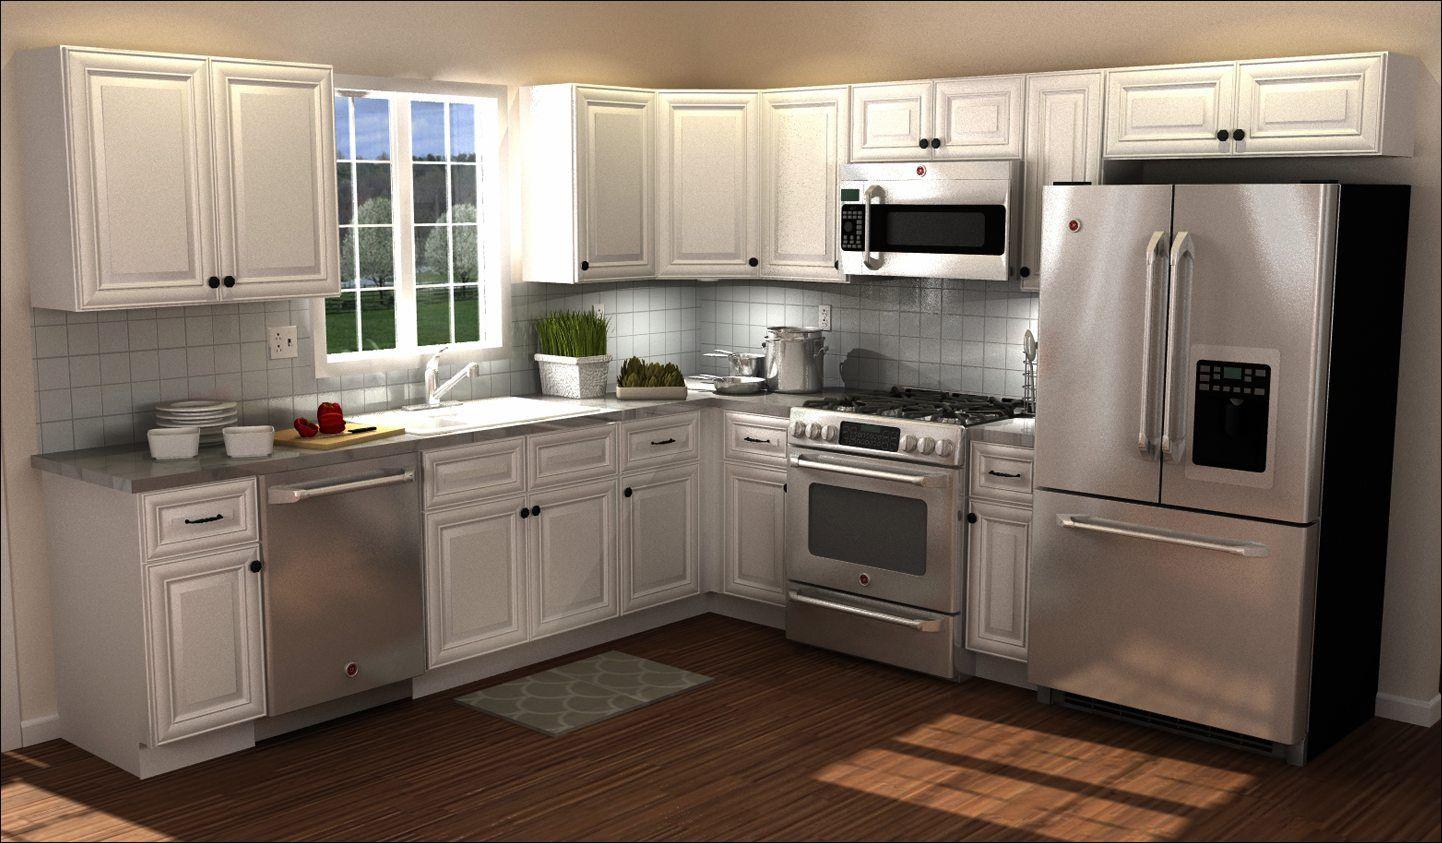 home decorators collection superb 10x10 kitchen design 6 kitchen remodel small kitchen on i kitchen remodel id=78354